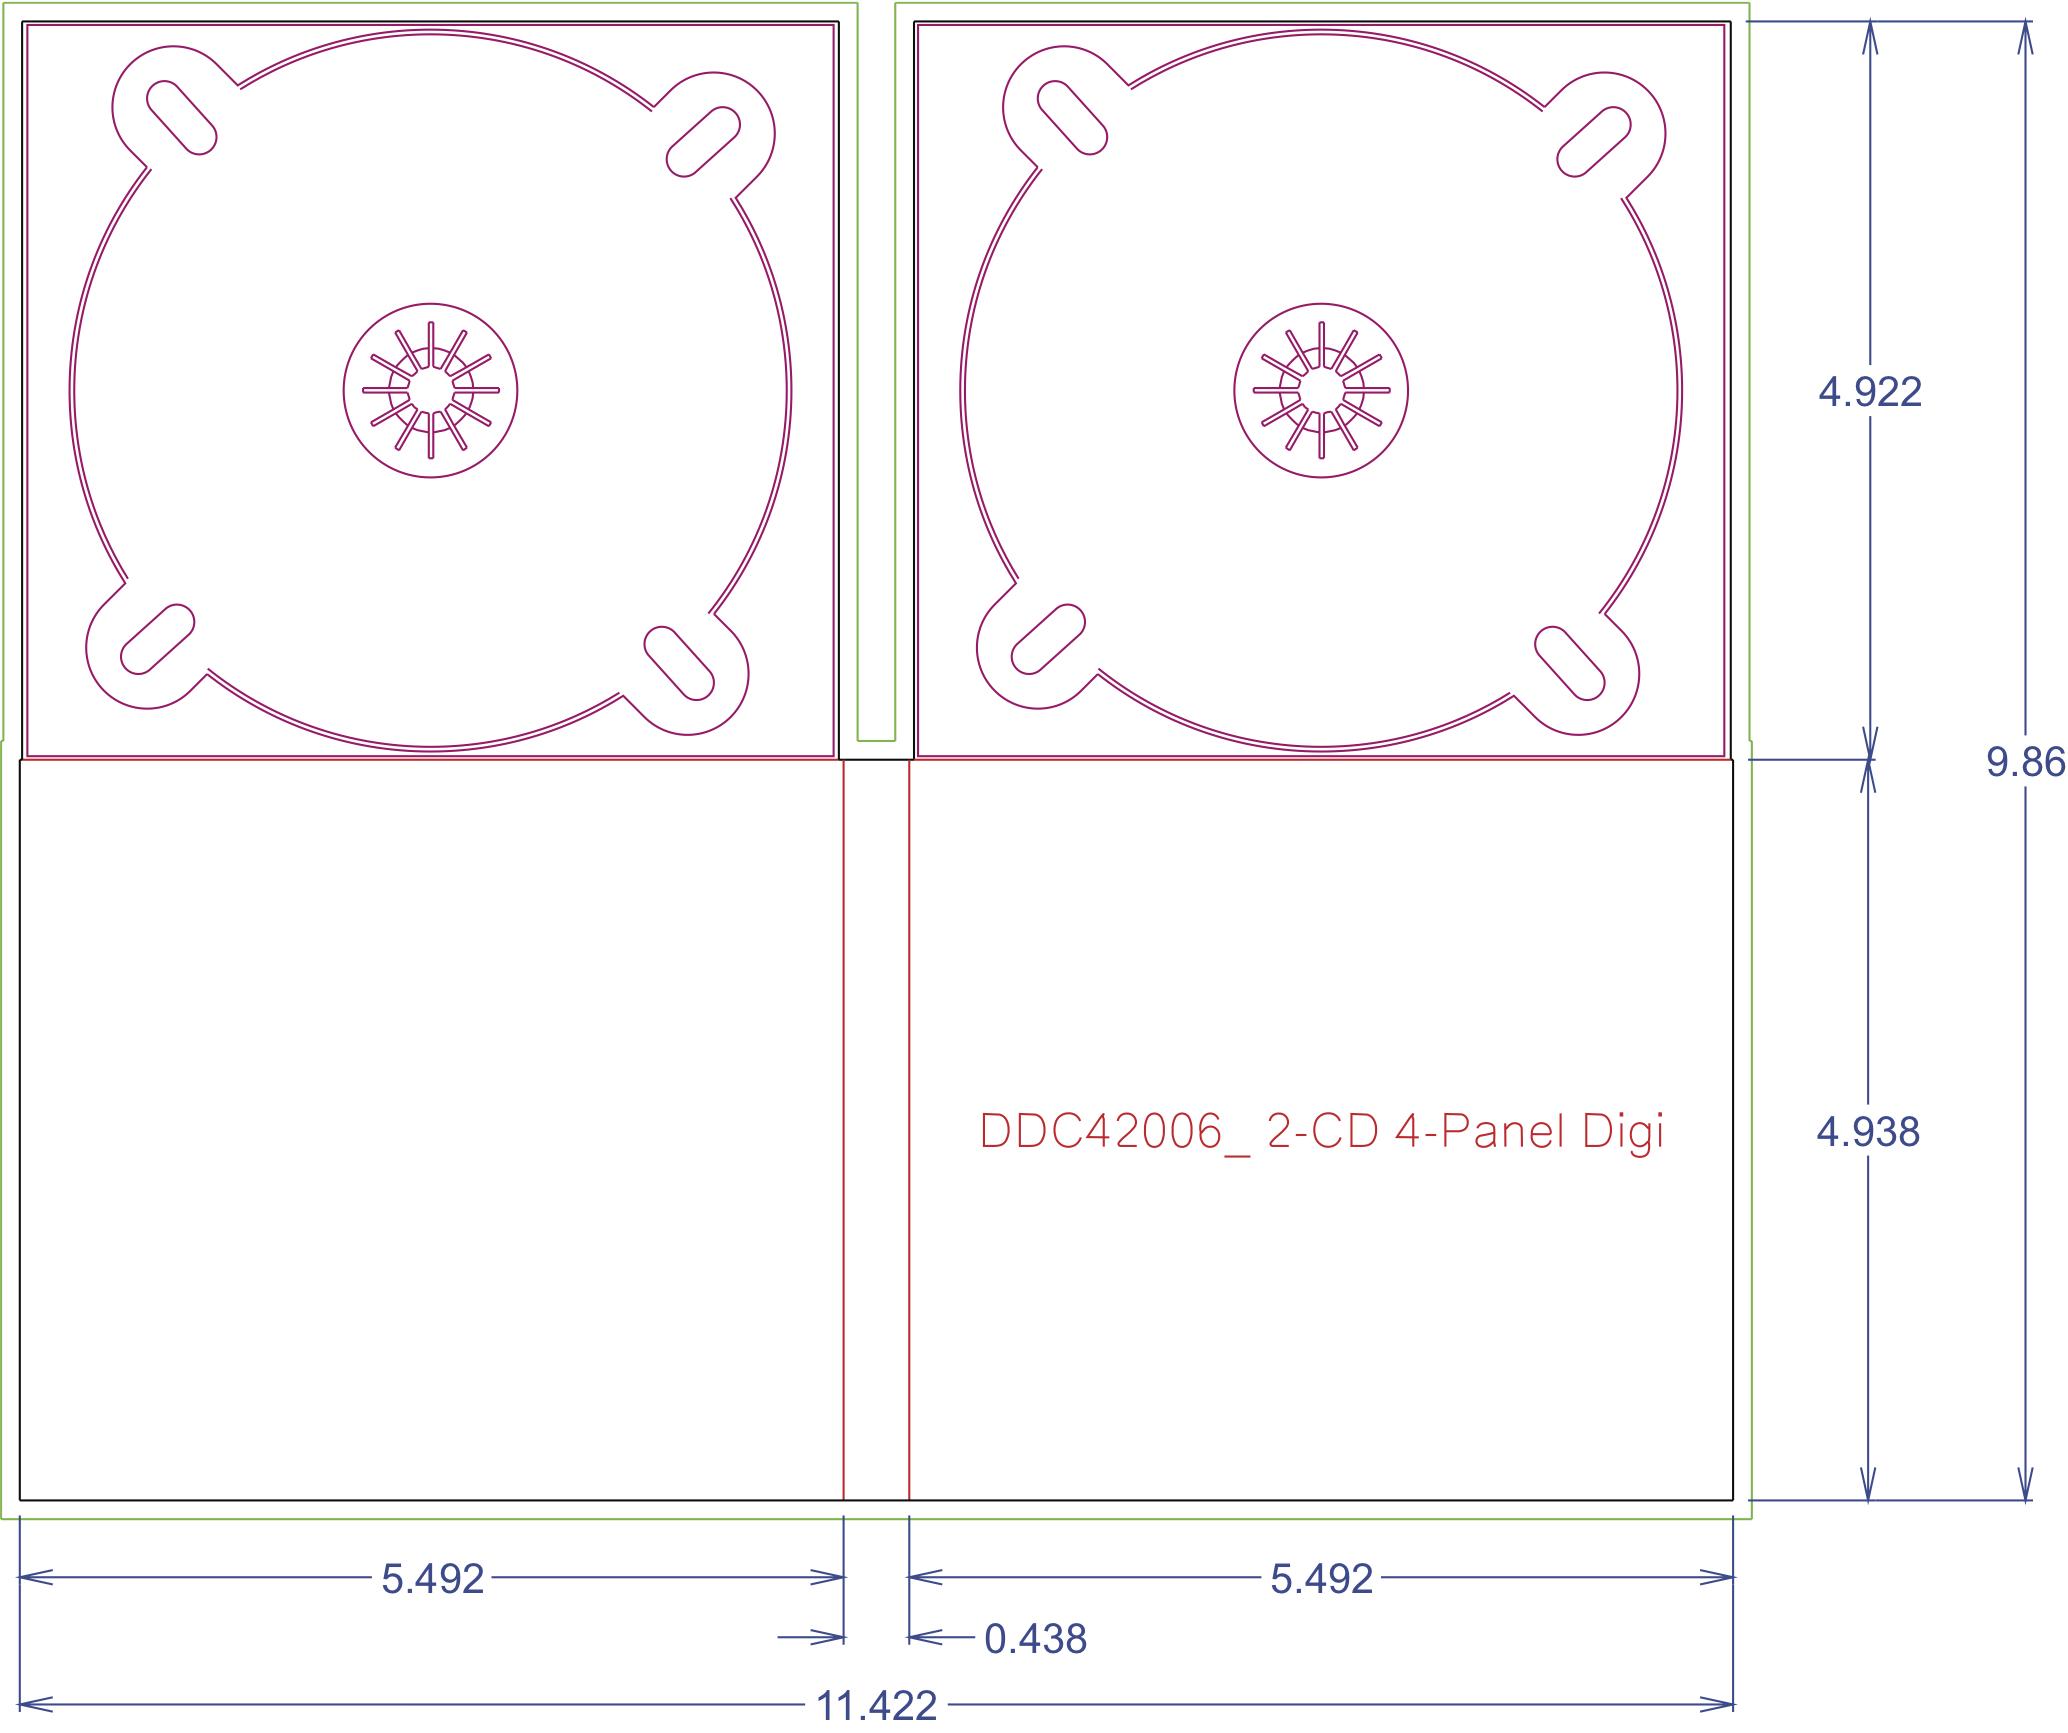 DDC42006 4 Panel Digi 2 Tray, No Pocket